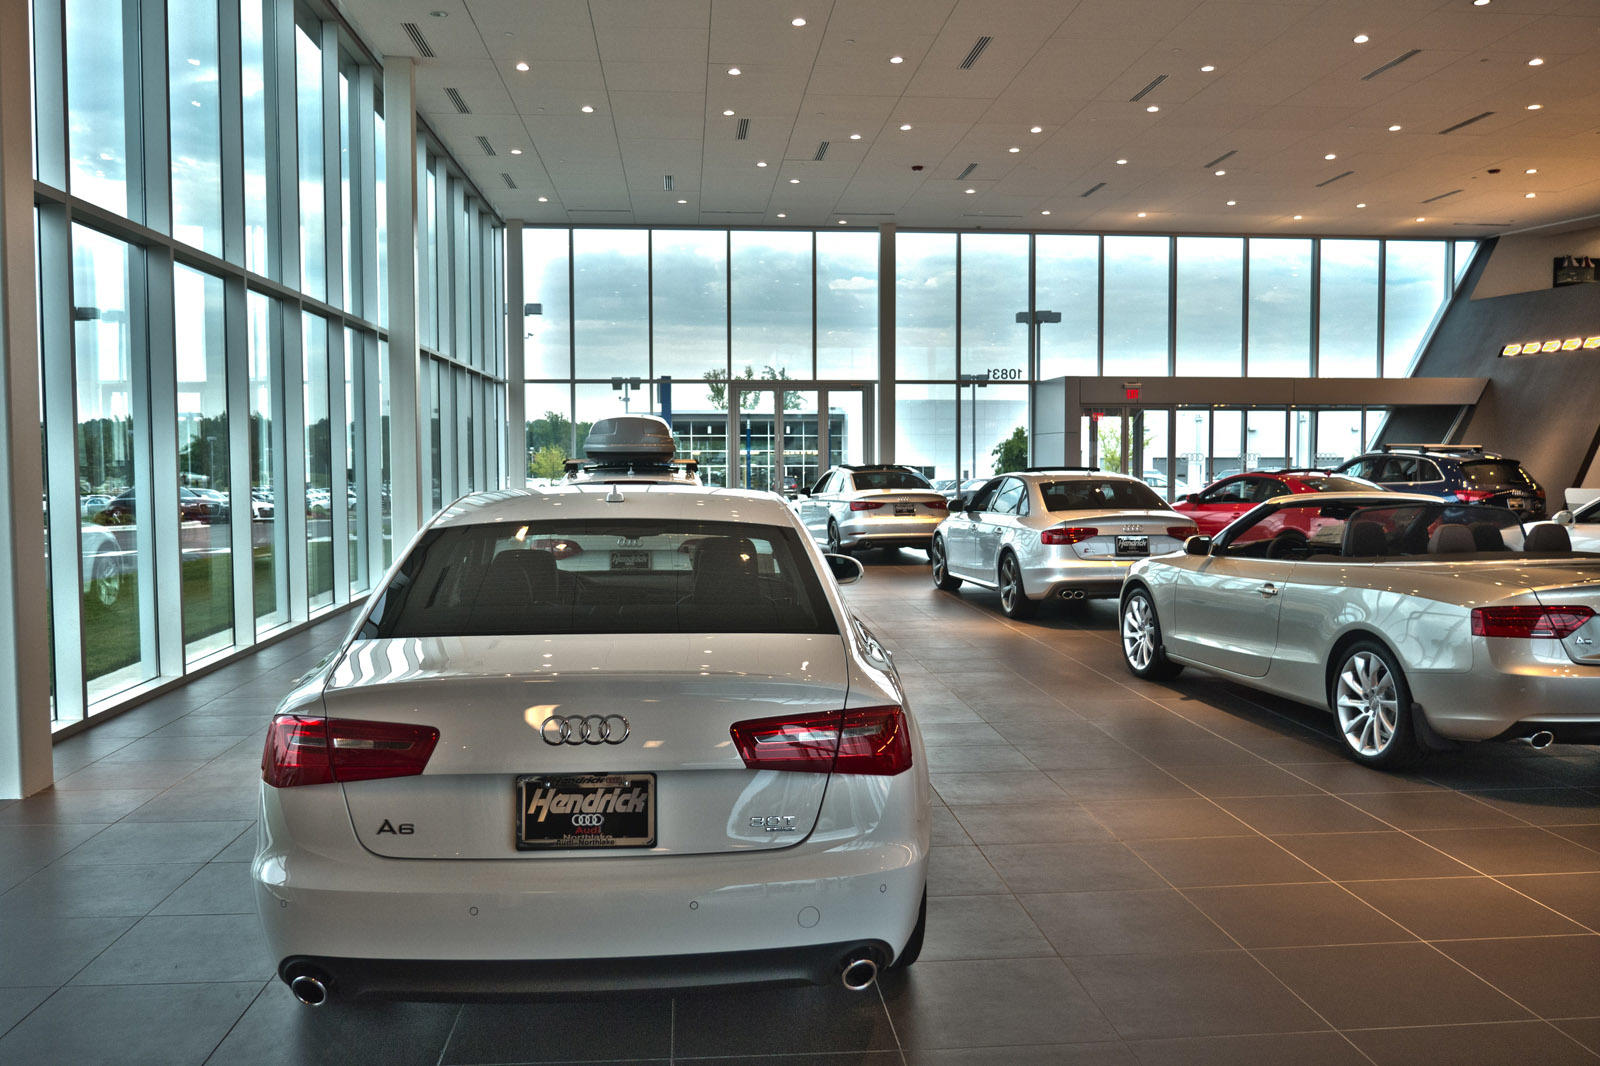 Audi Northlake Charlotte North Carolina Nc